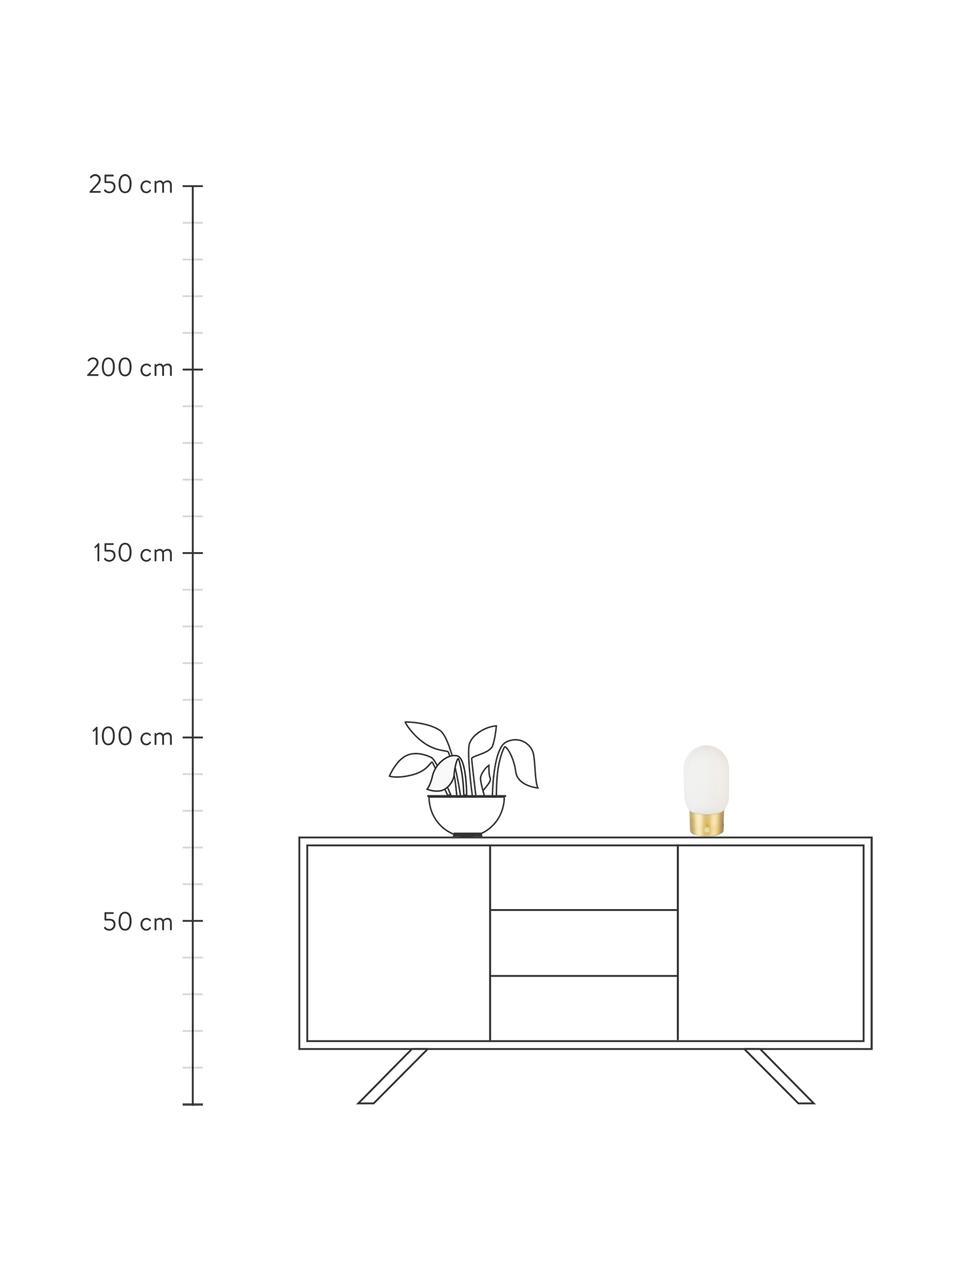 Kleine Dimmbare Nachttischlampe Urban mit USB-Anschluss, Lampenschirm: Opalglas, Lampenfuß: Metall, beschichtet, Goldfarben, Opalweiß, Ø 13 x H 25 cm